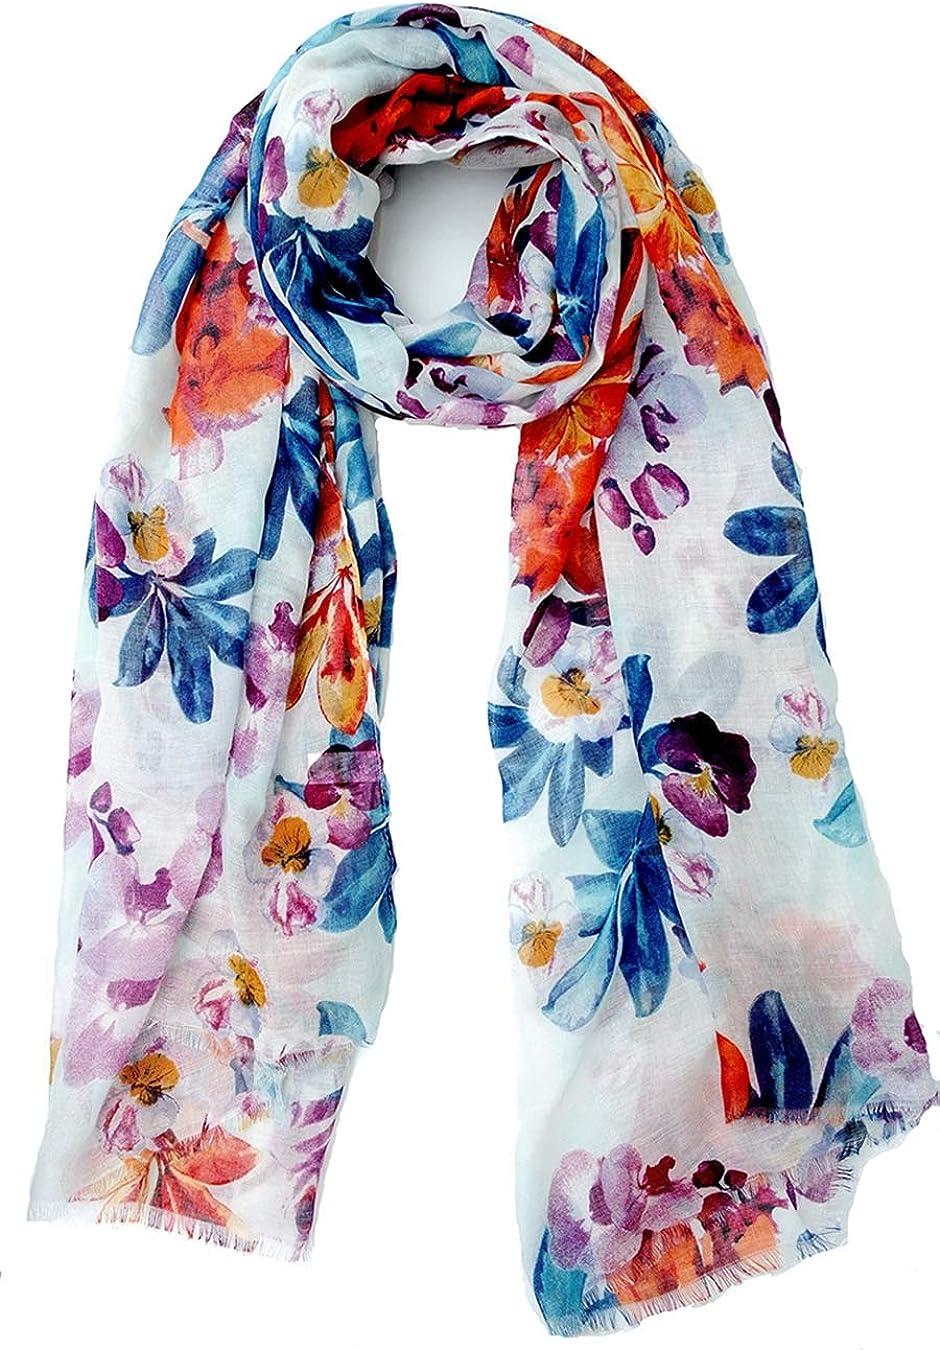 Scarfs for Women Lightweight Floral Flower Winter Scarf Large Fashion Wrap Shawls Oversized Cape tassel Fall Scarves